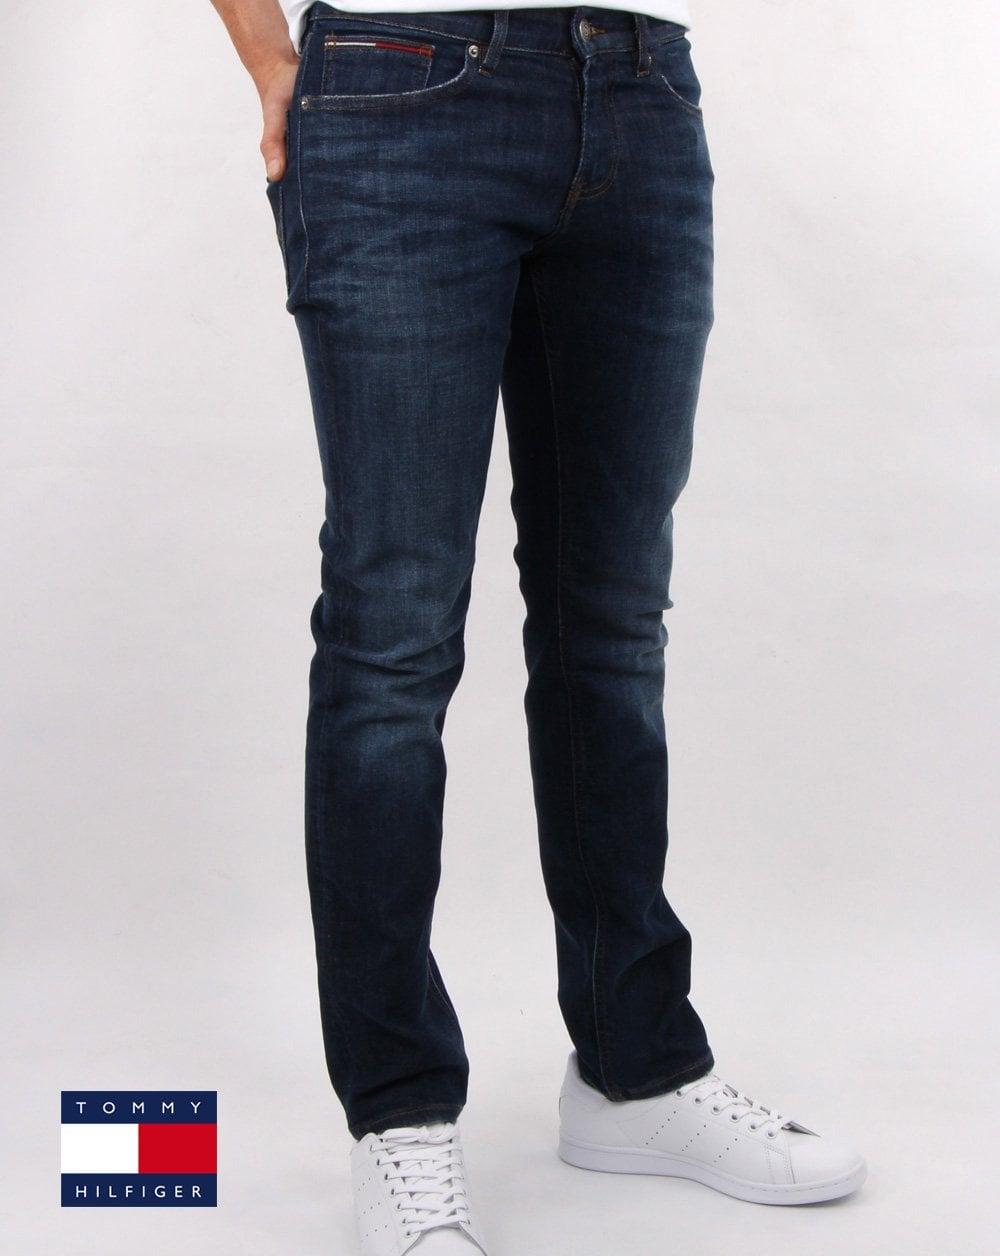 f78128f8 Tommy Hilfiger Jeans Tommy Hilfiger Slim Scanton Dynamic Stretch Jeans Dark  Blue